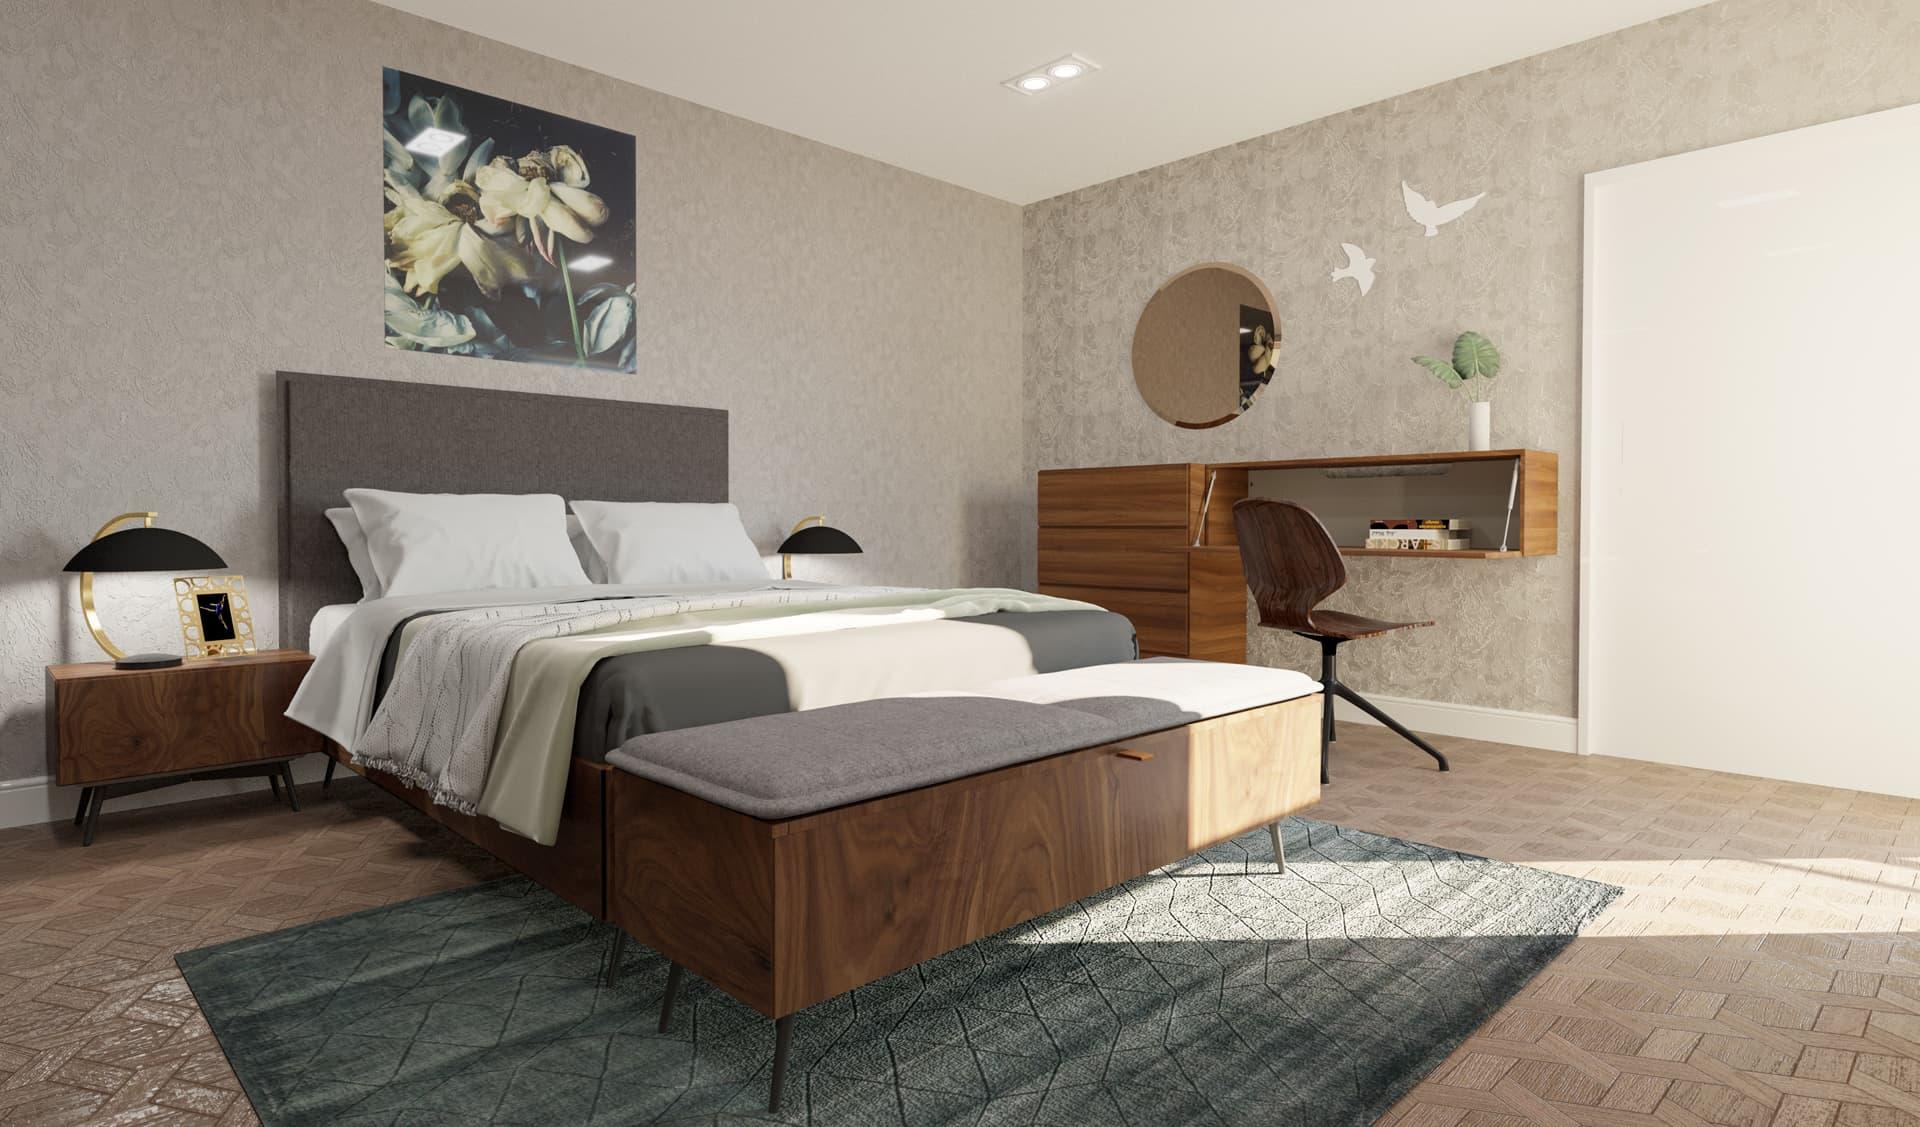 9/12 BedRoom, Loft, Design Package